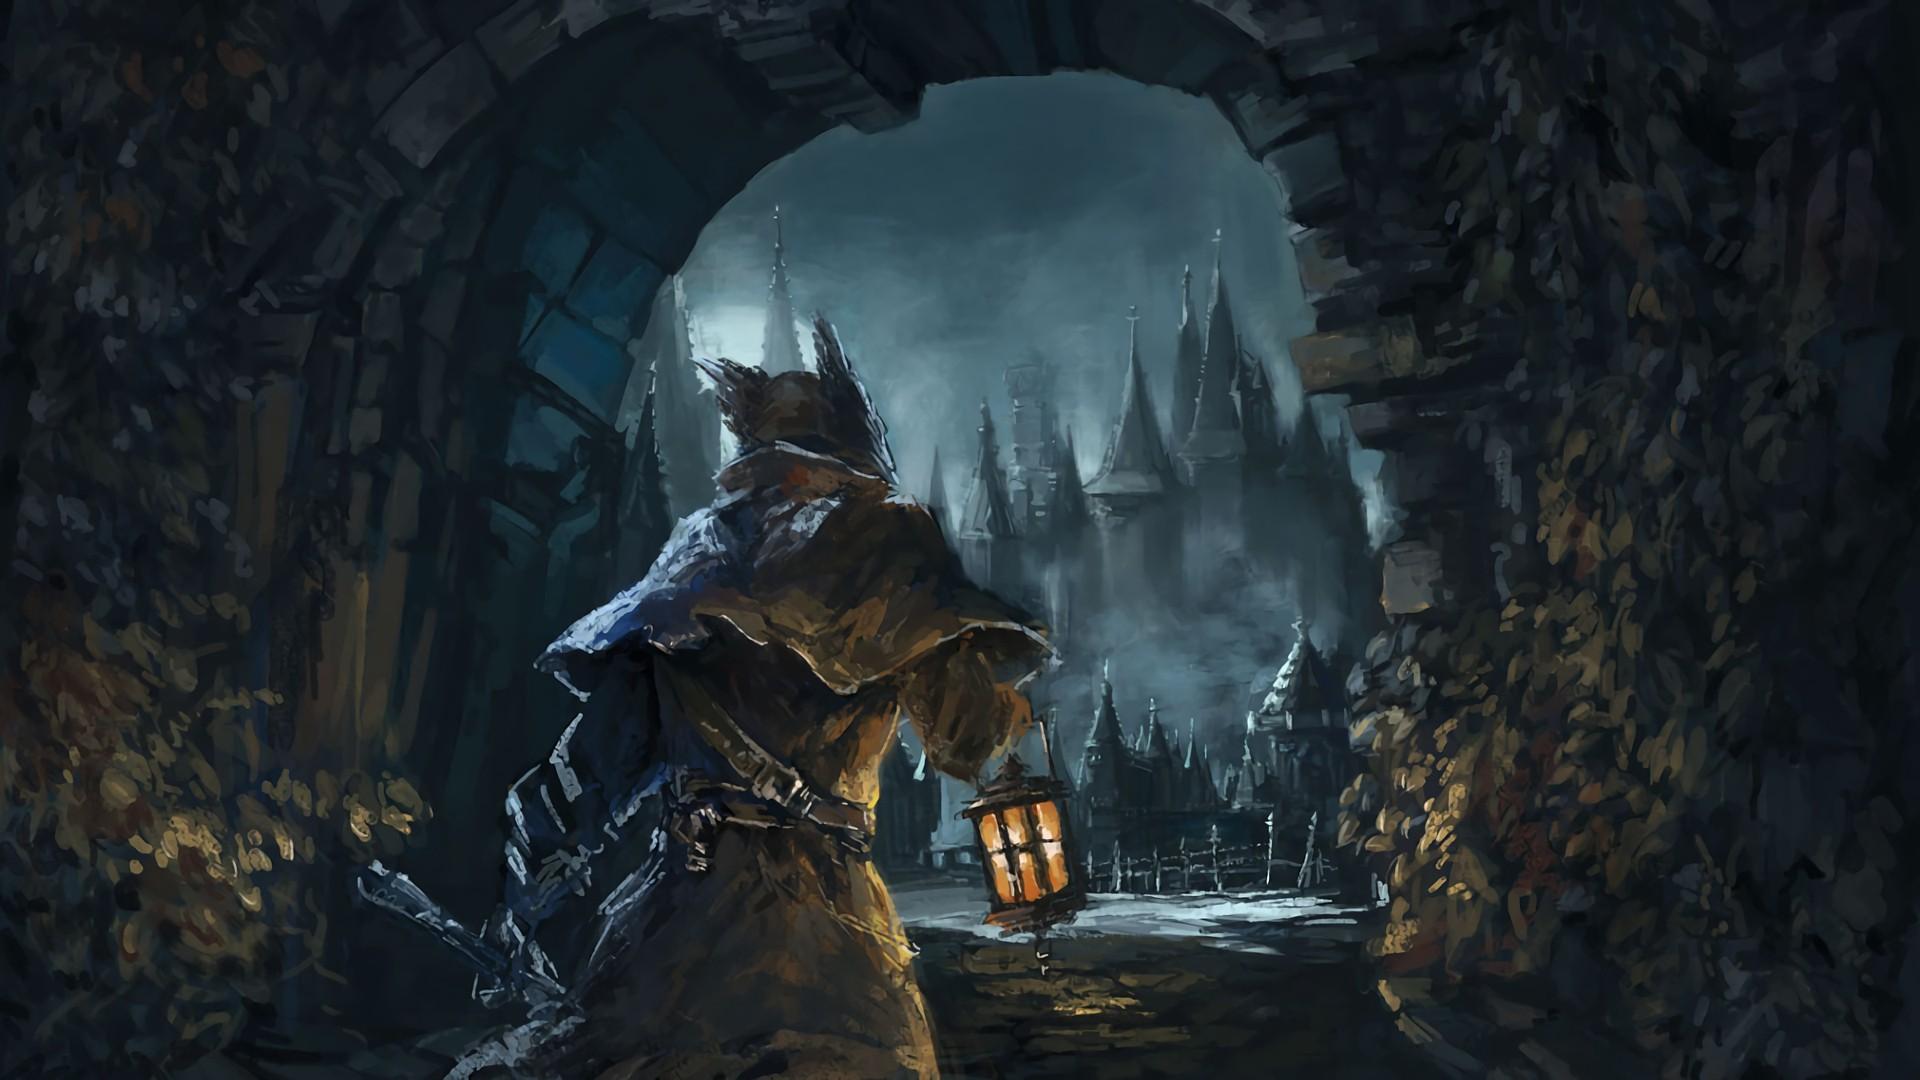 Wallpaper : Bloodborne, Mythology, Darkness, Screenshot